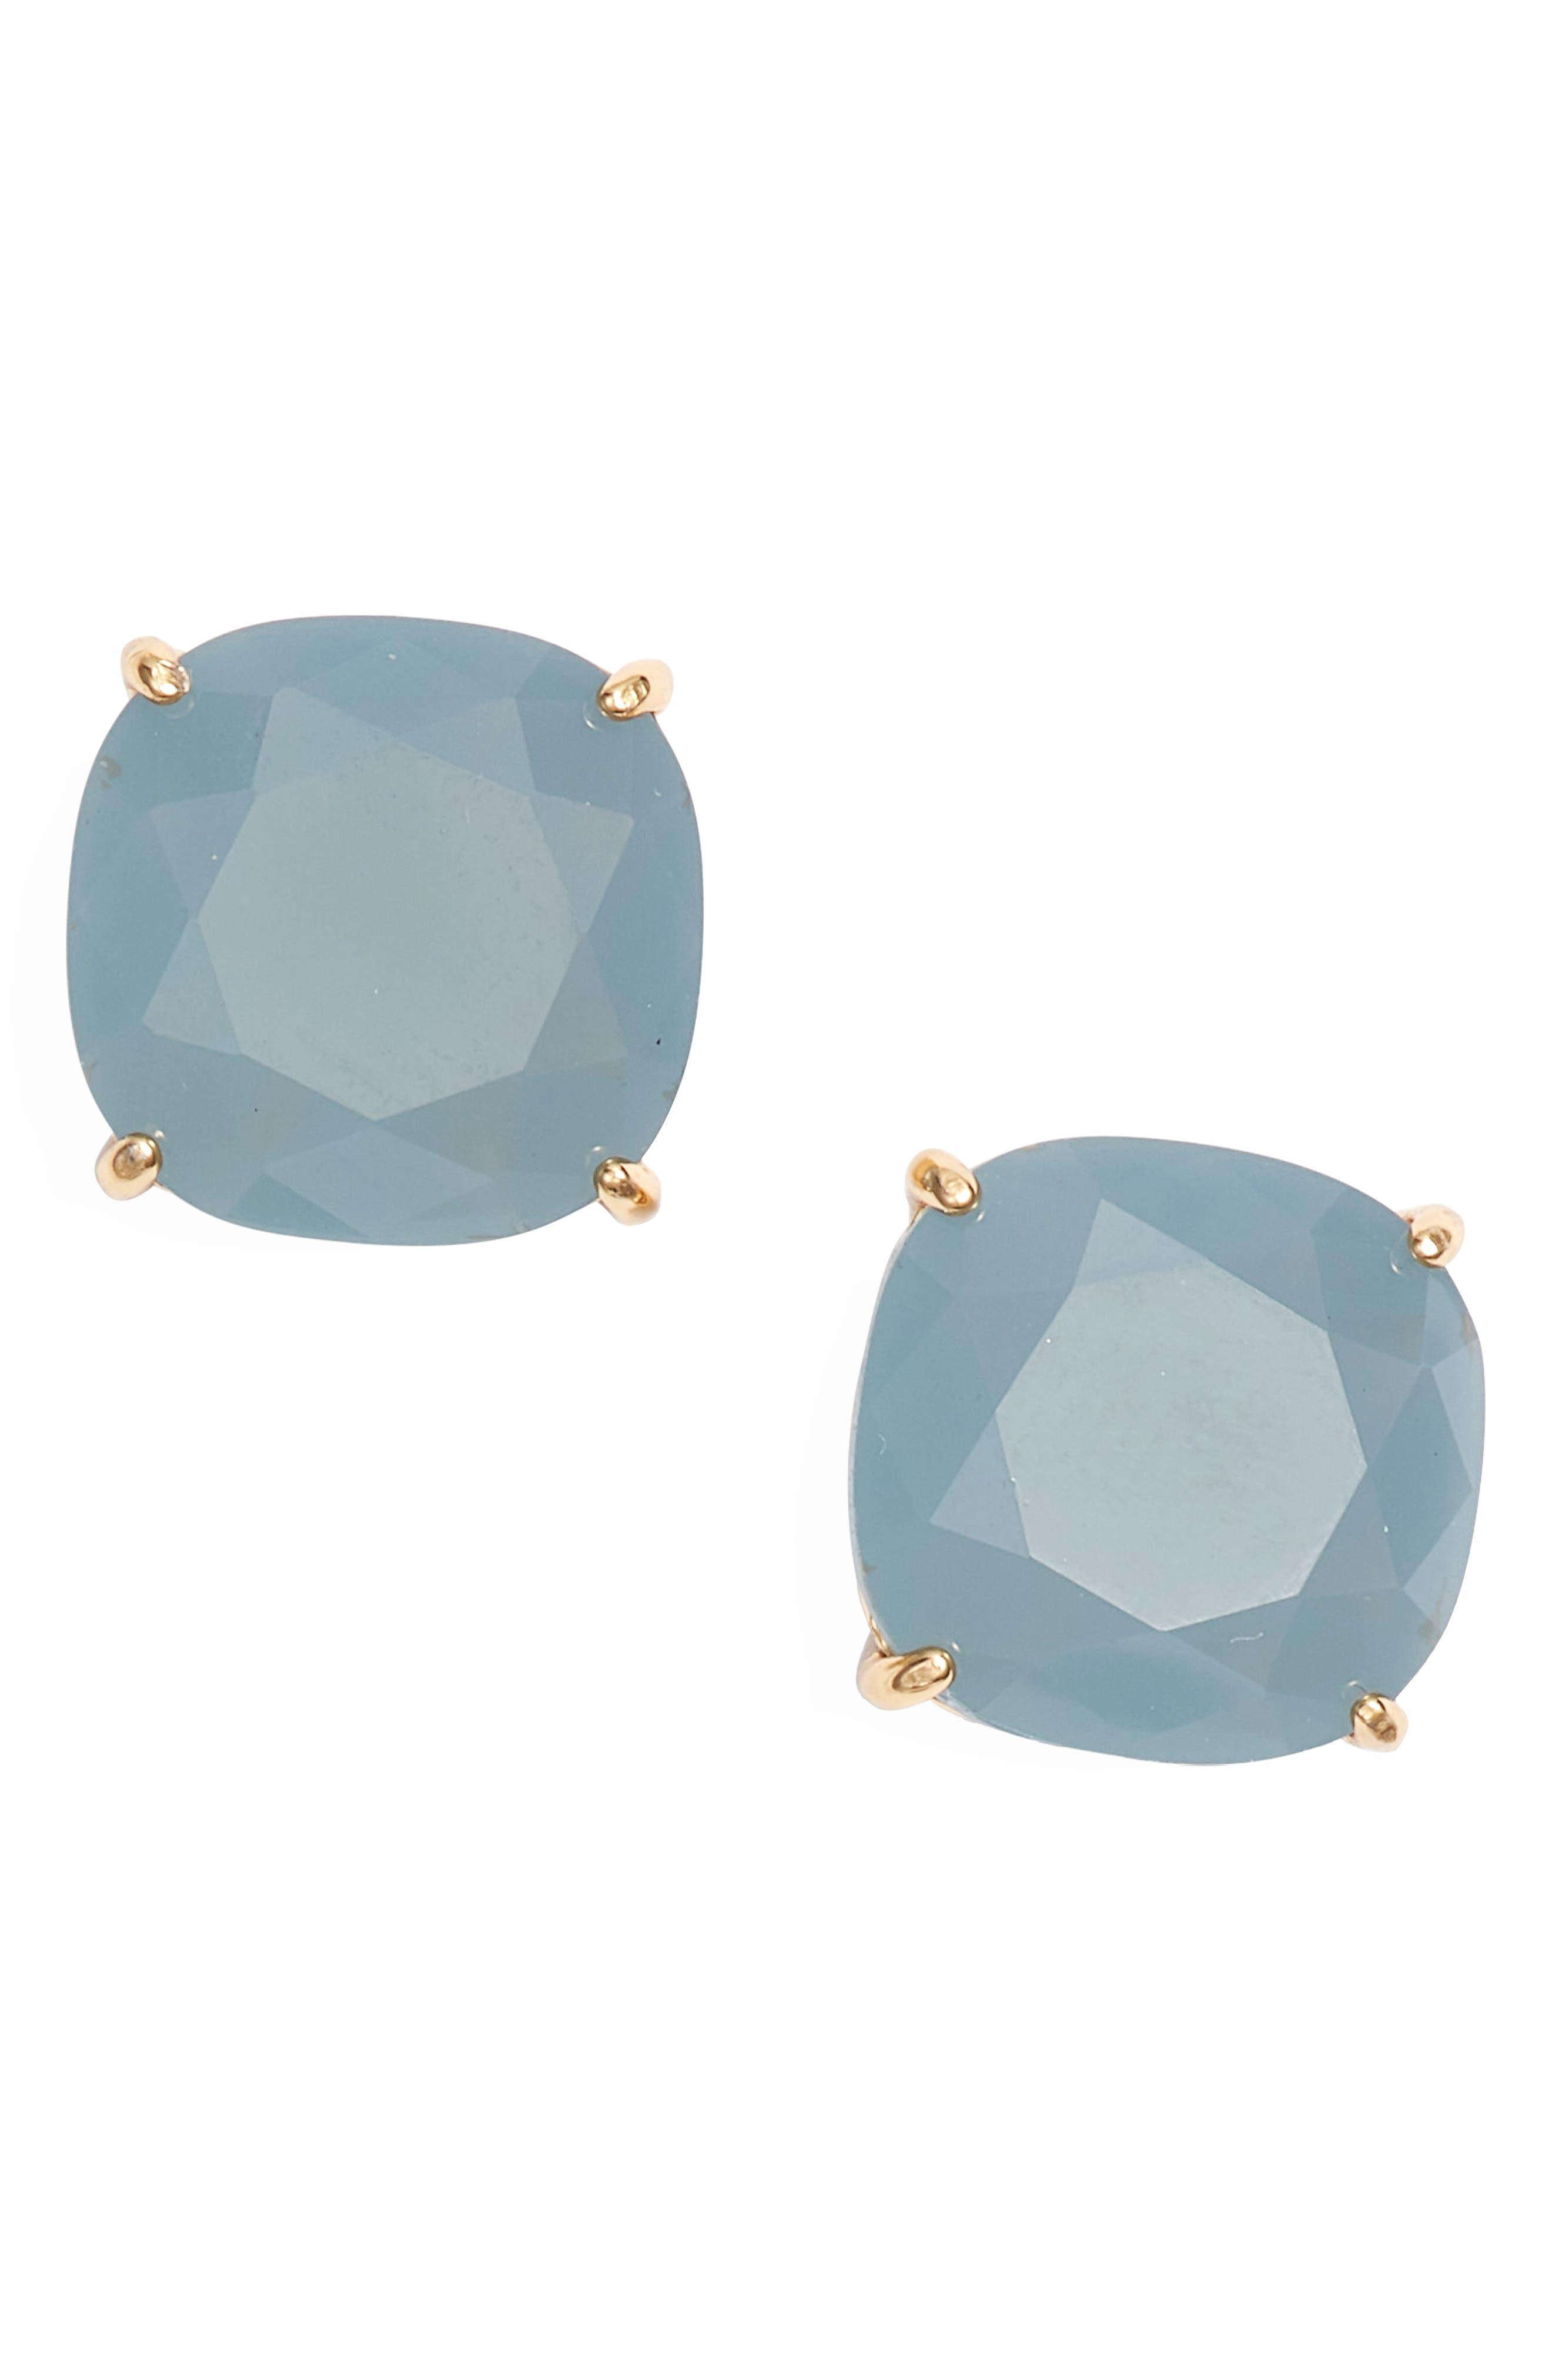 KATE SPADE NEW YORK,                             small square stud earrings,                             Main thumbnail 1, color,                             SERENE BLUE